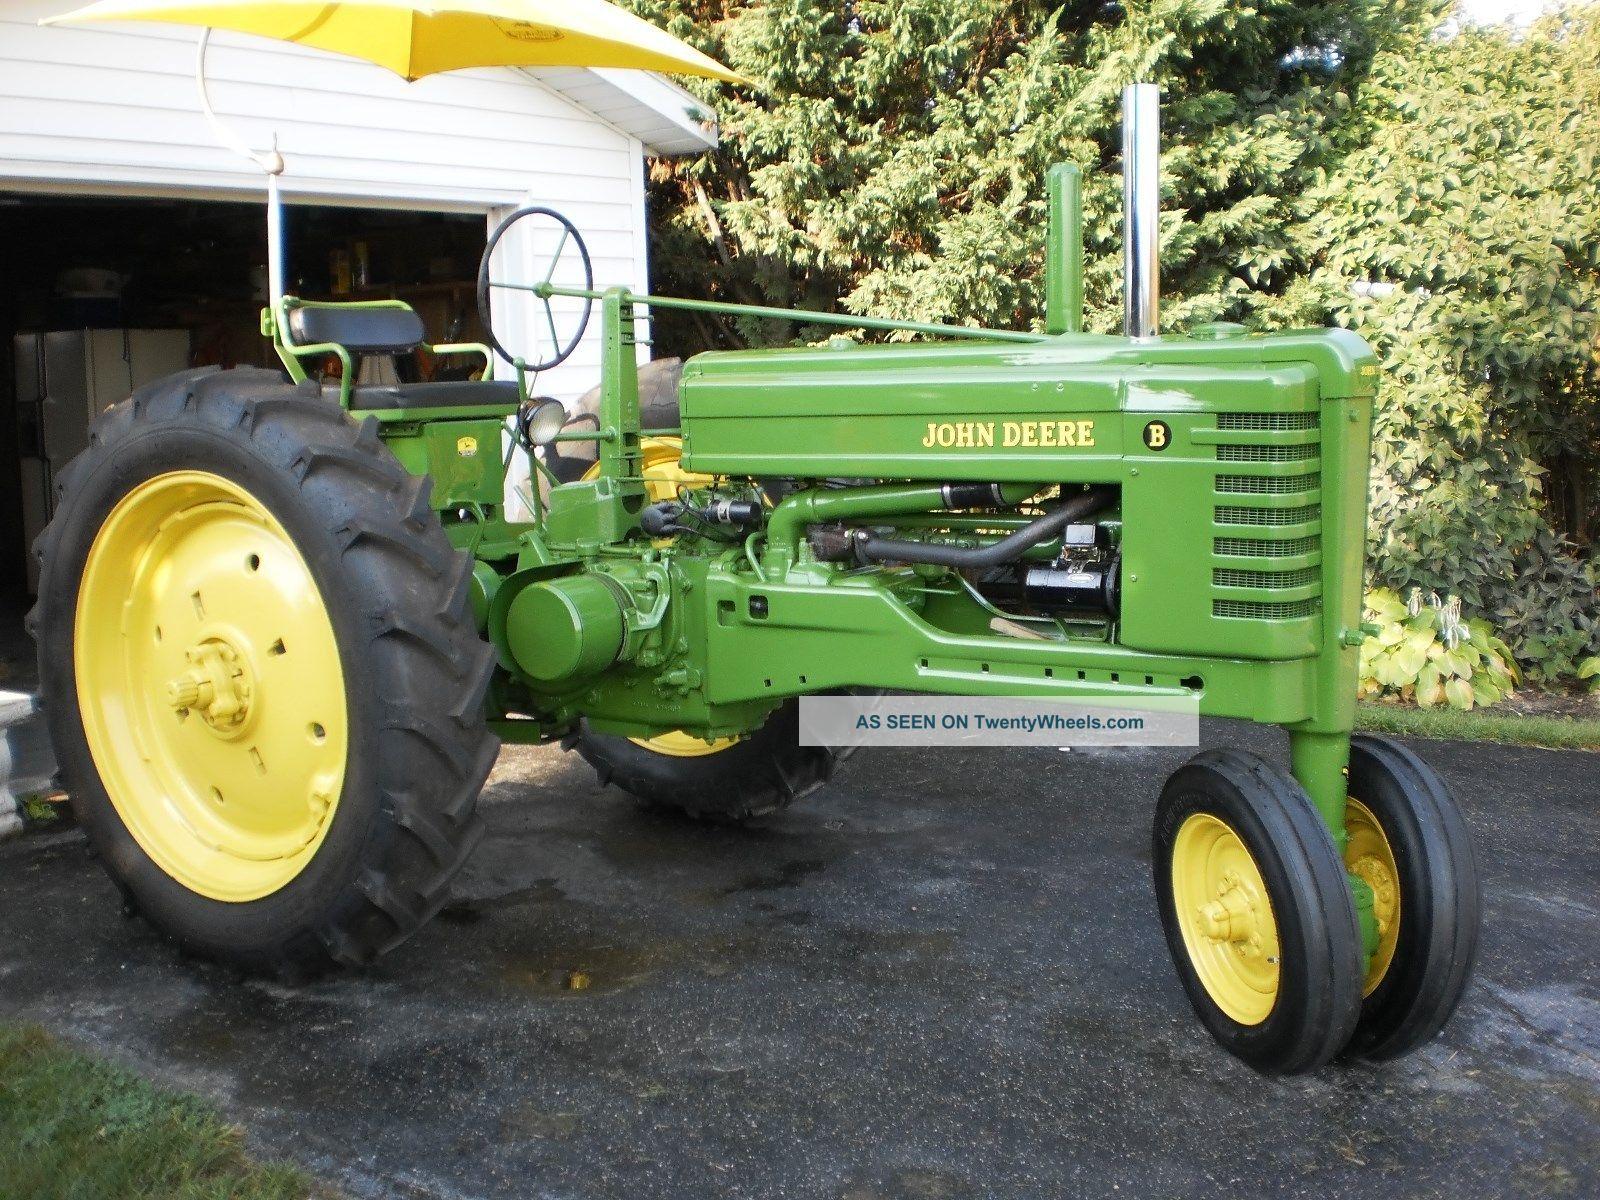 1952 Vintage John Deere B Tractor Restored